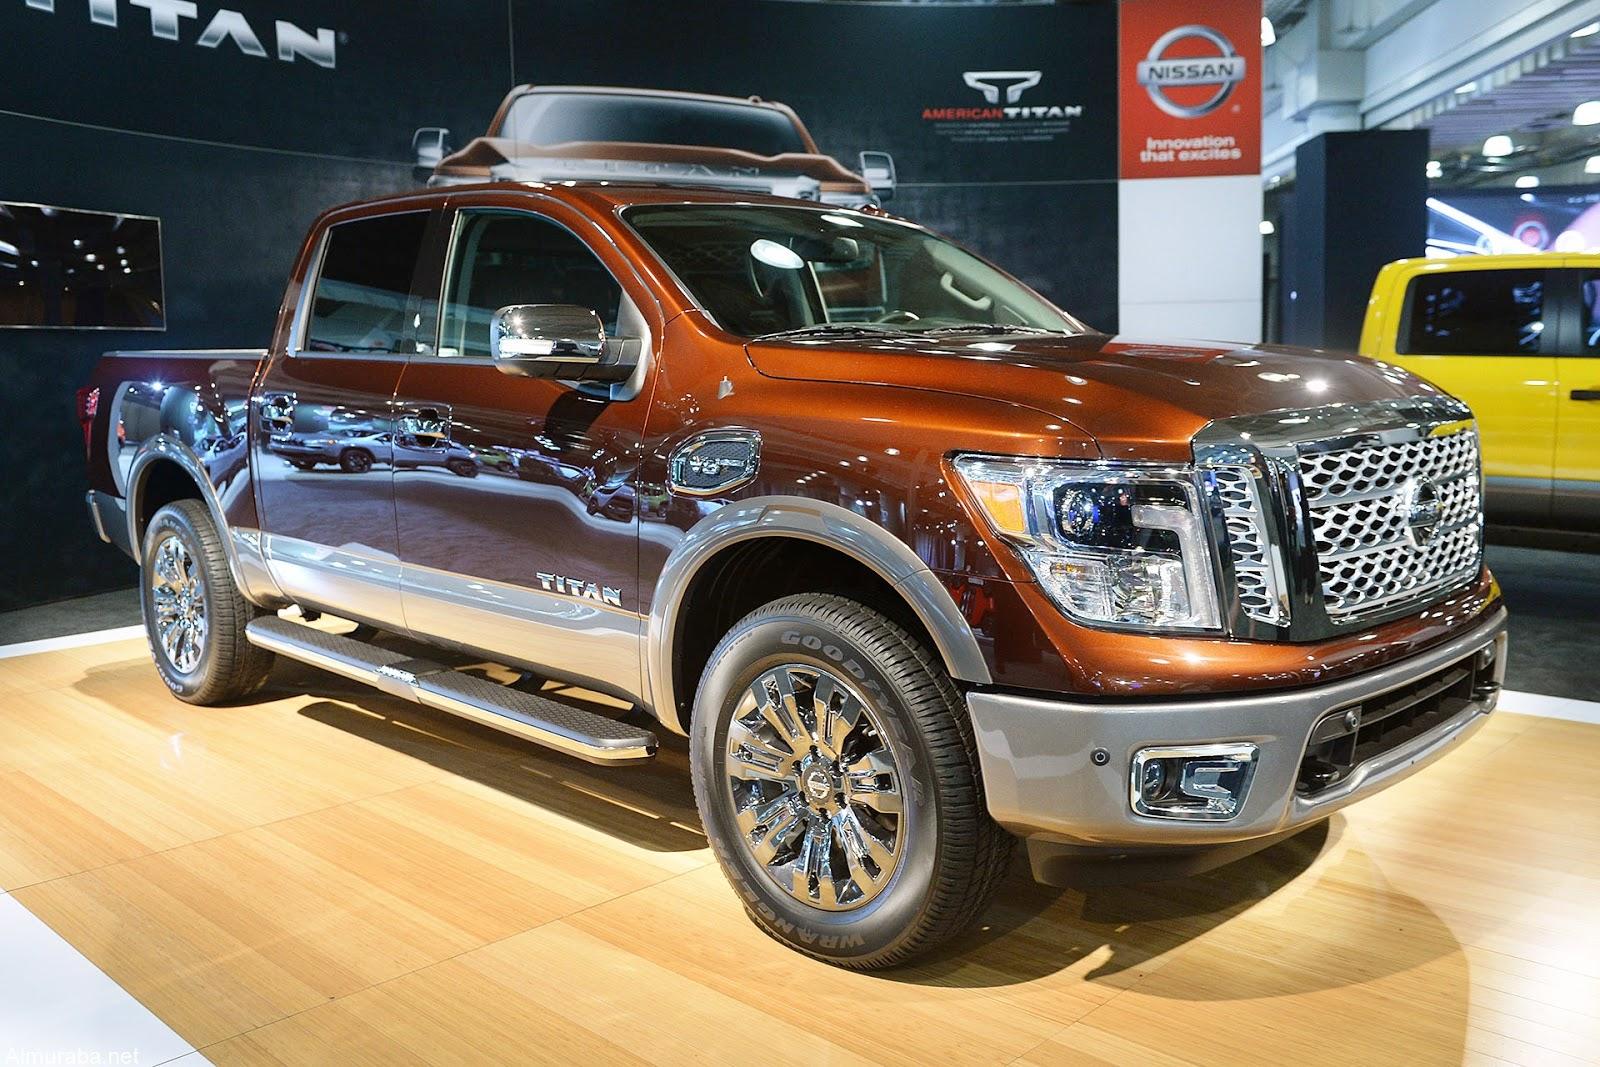 automotive assembly line watch a nissan titan xd pickup truck get built in under 3 minutes. Black Bedroom Furniture Sets. Home Design Ideas